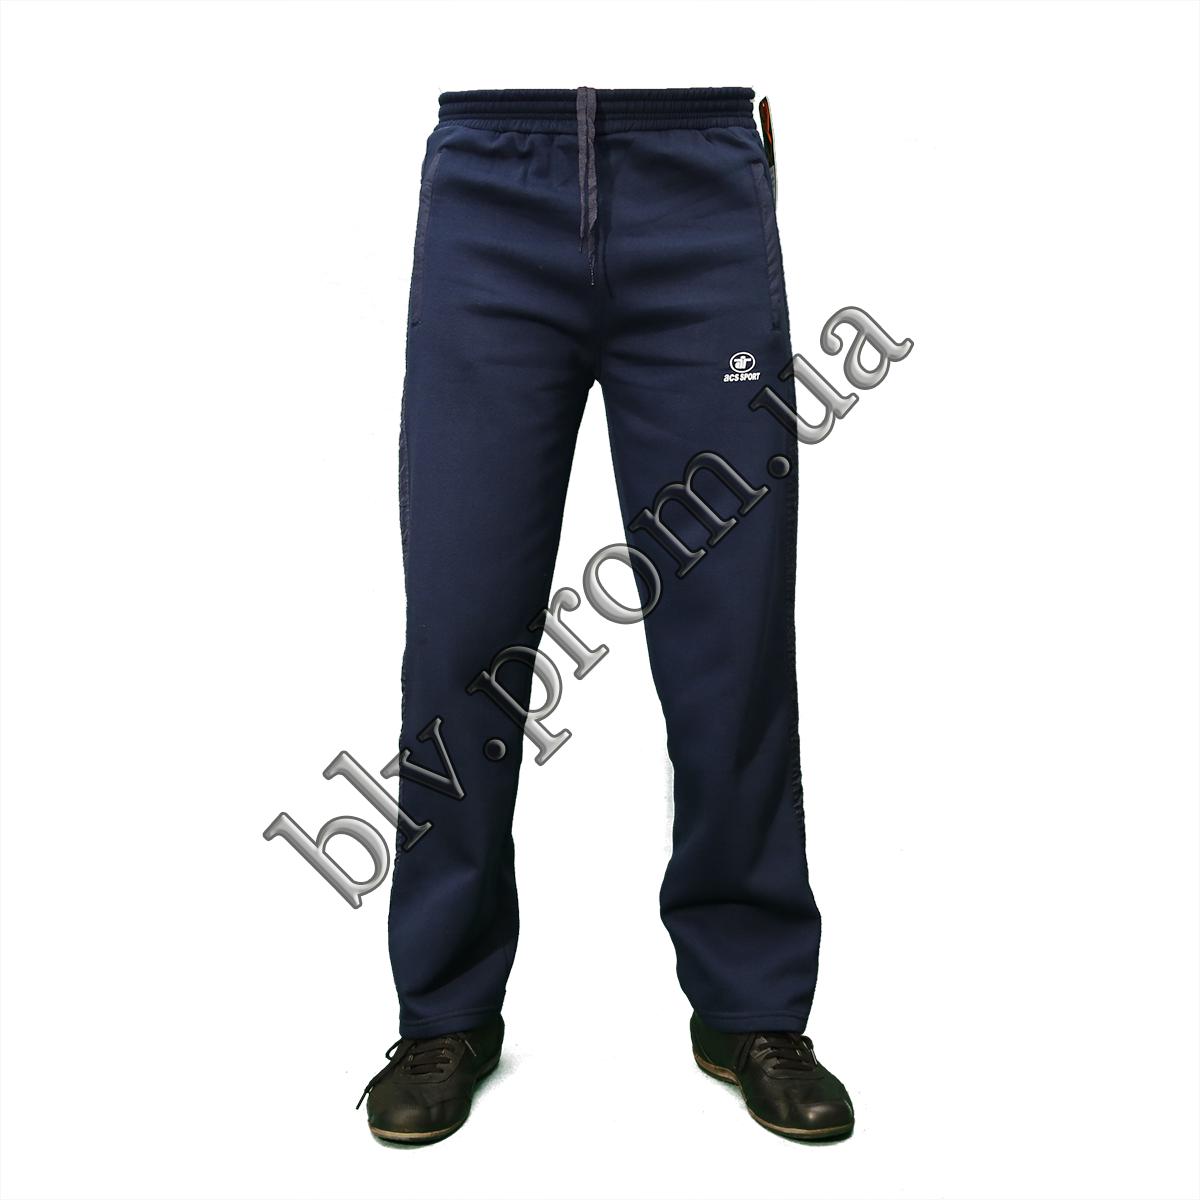 Теплые мужские брюки байка KD684 Indigo